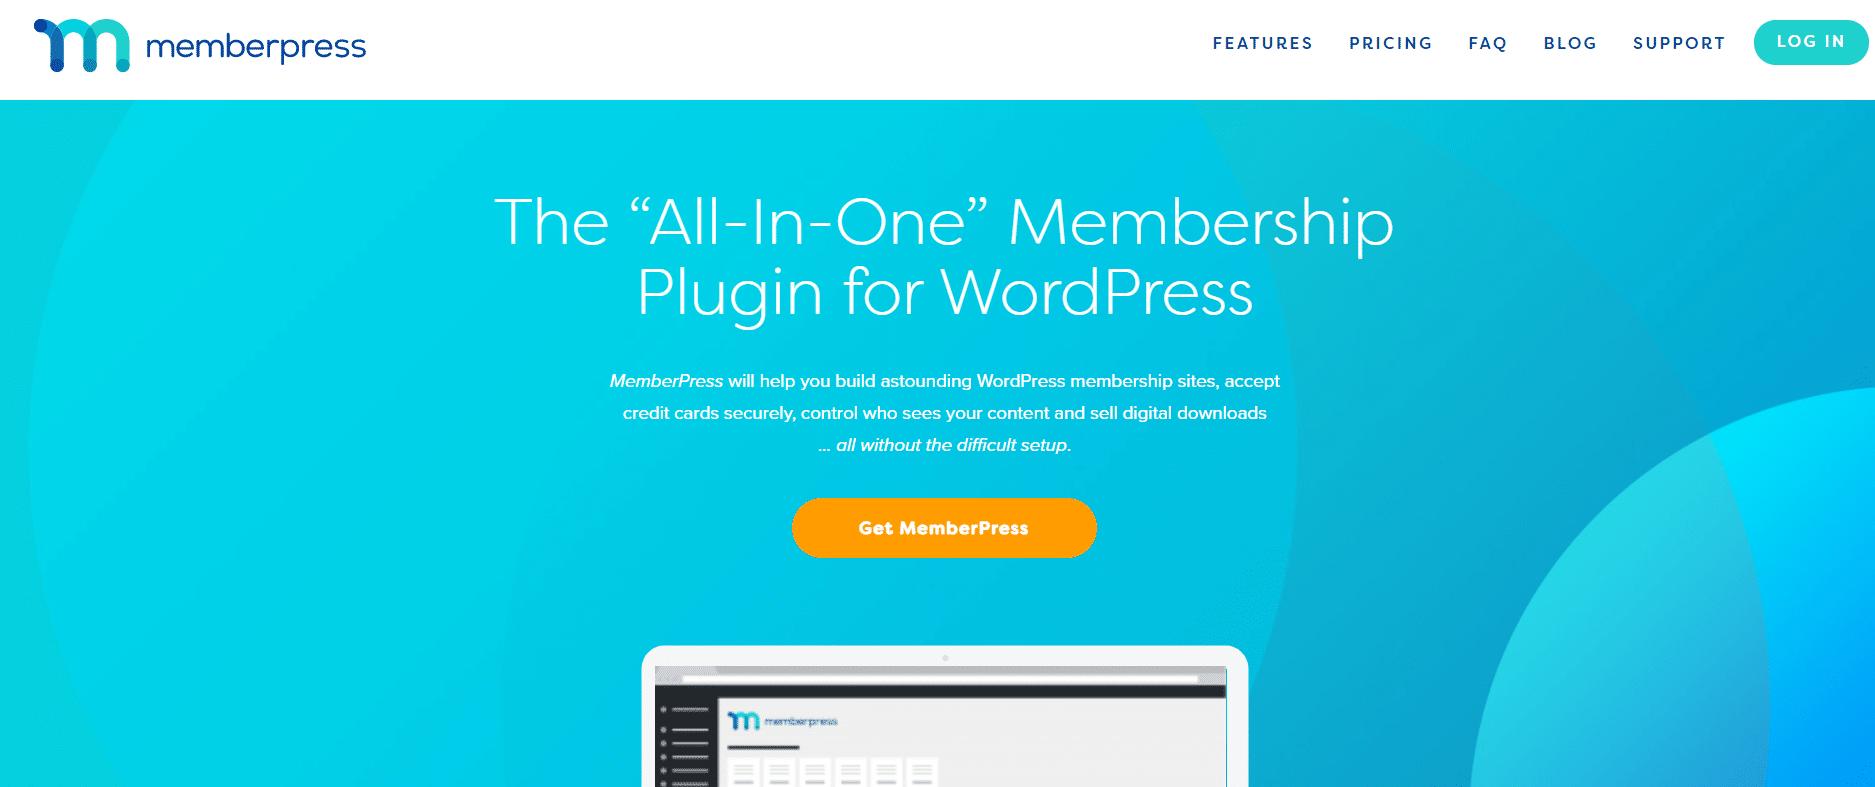 memberpress best wordpress plugins